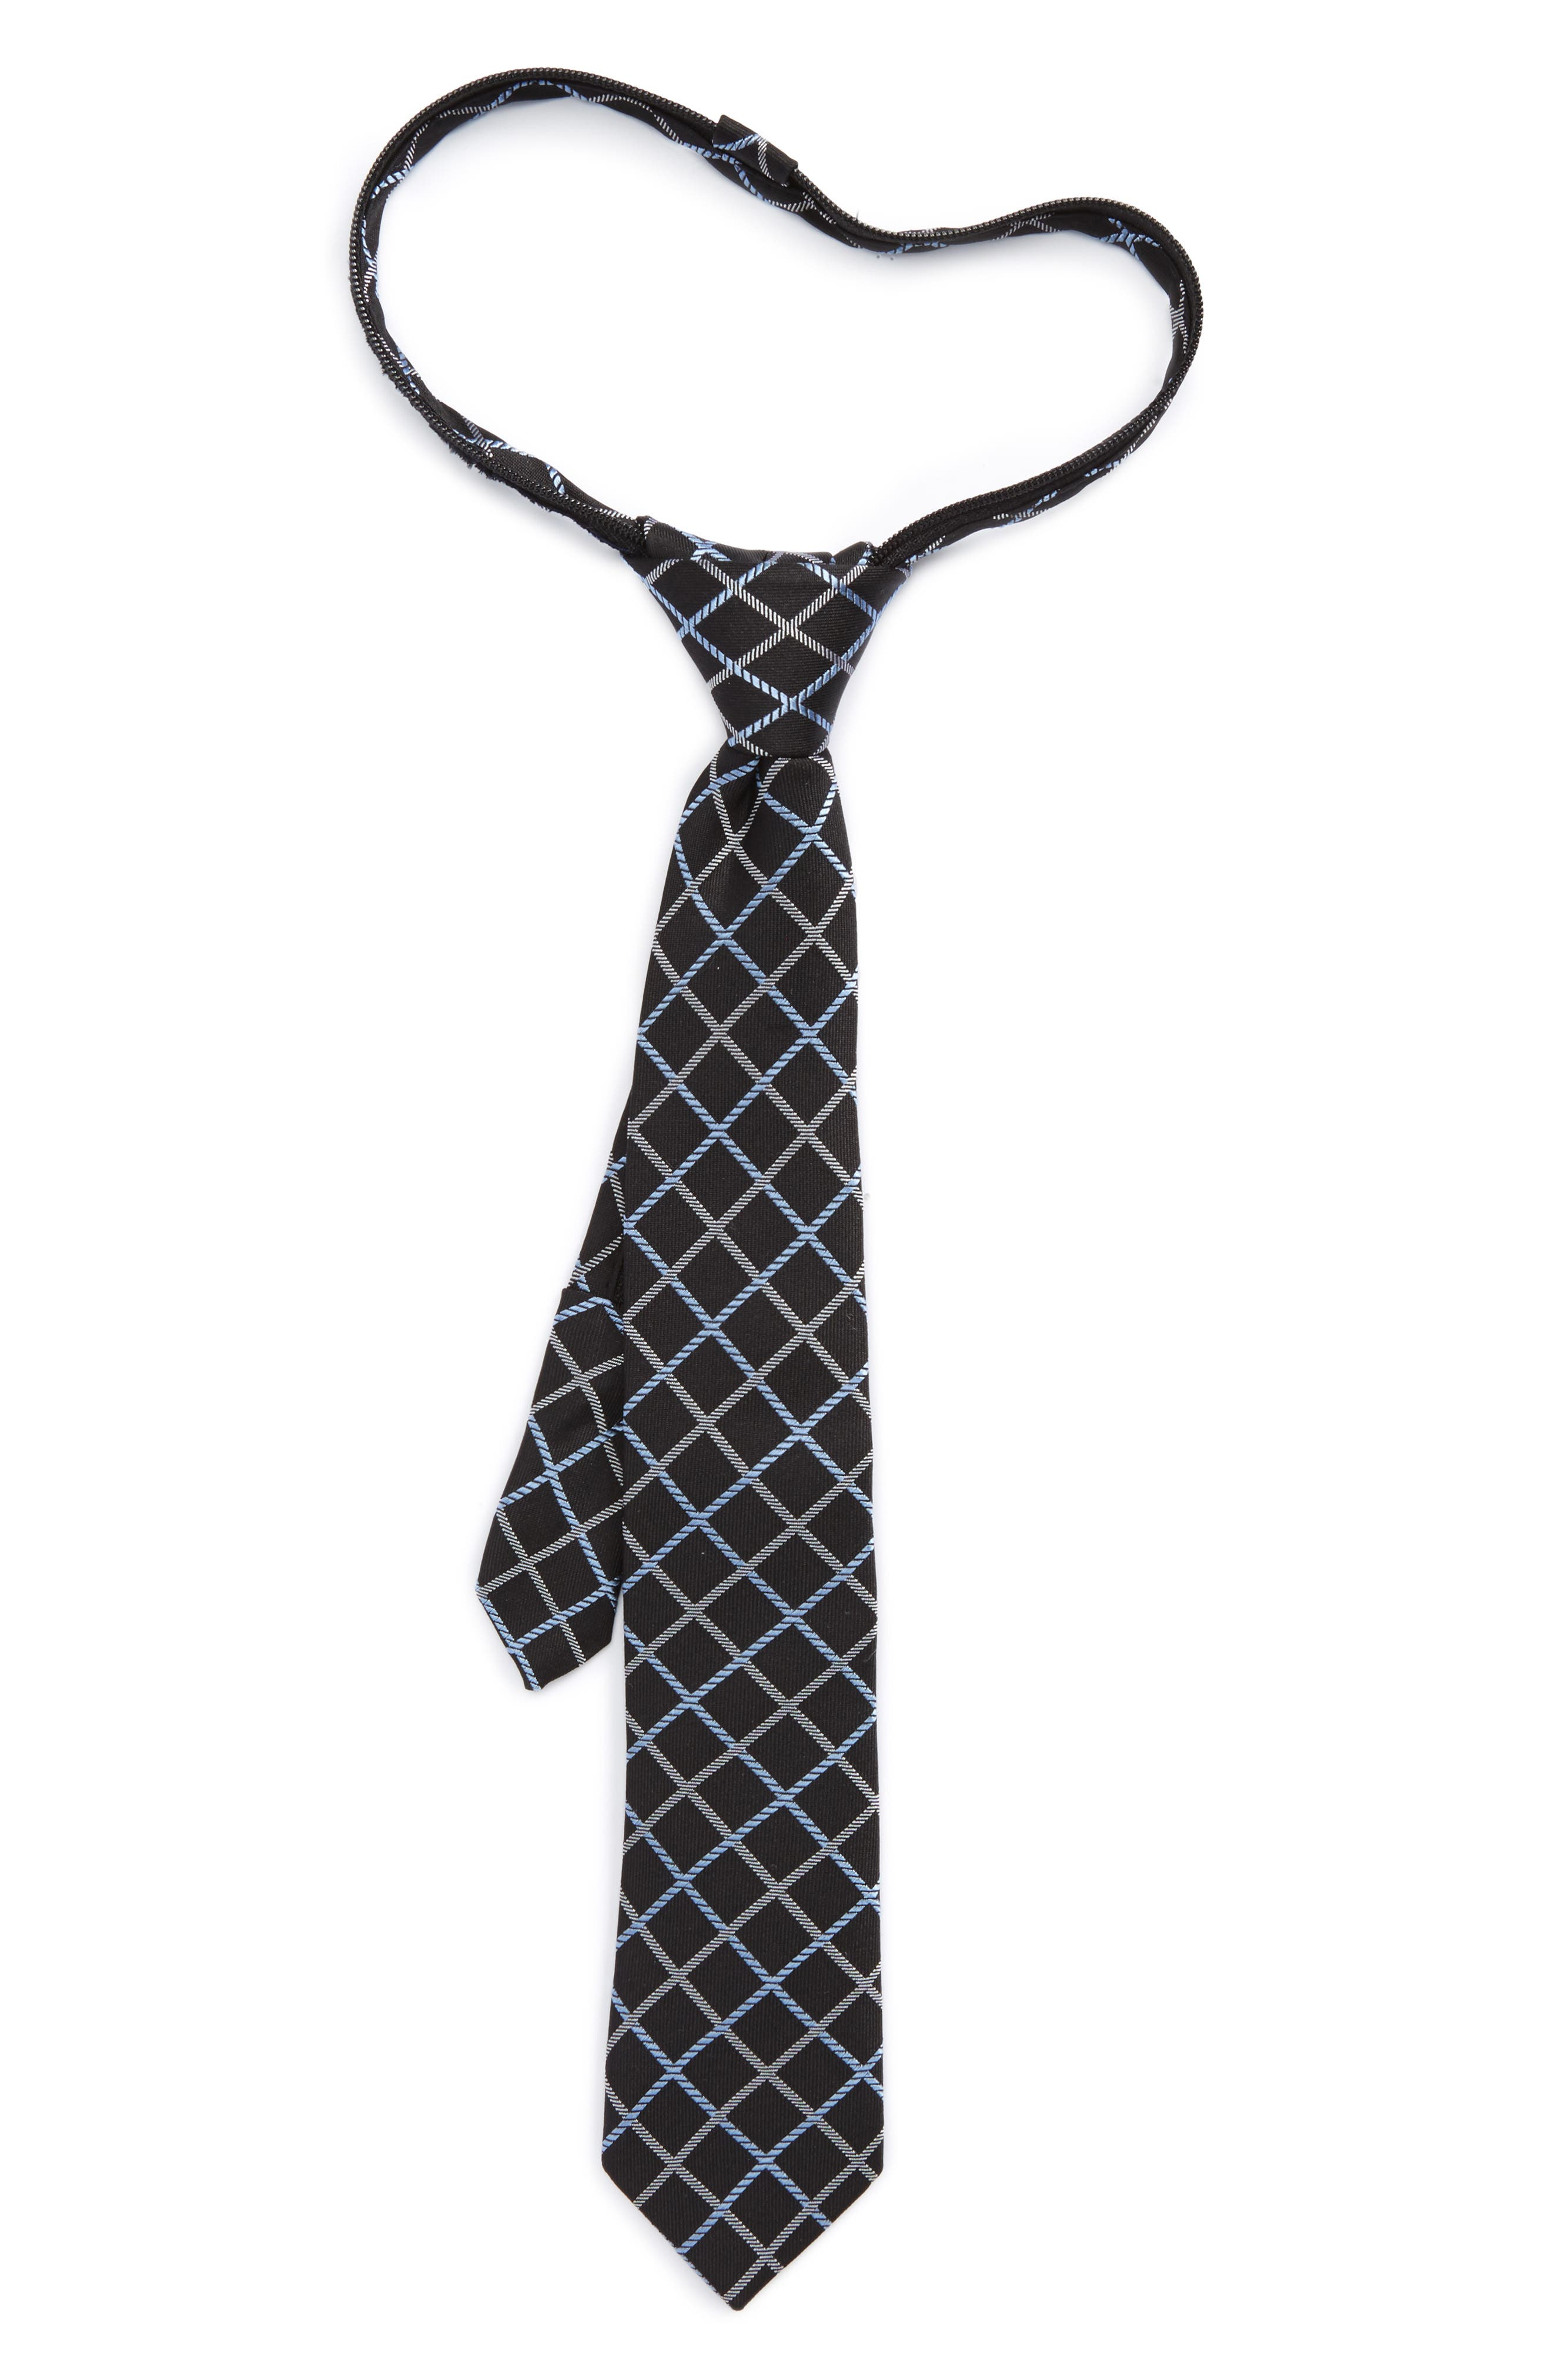 Plaid Silk Zip Tie,                         Main,                         color, Black